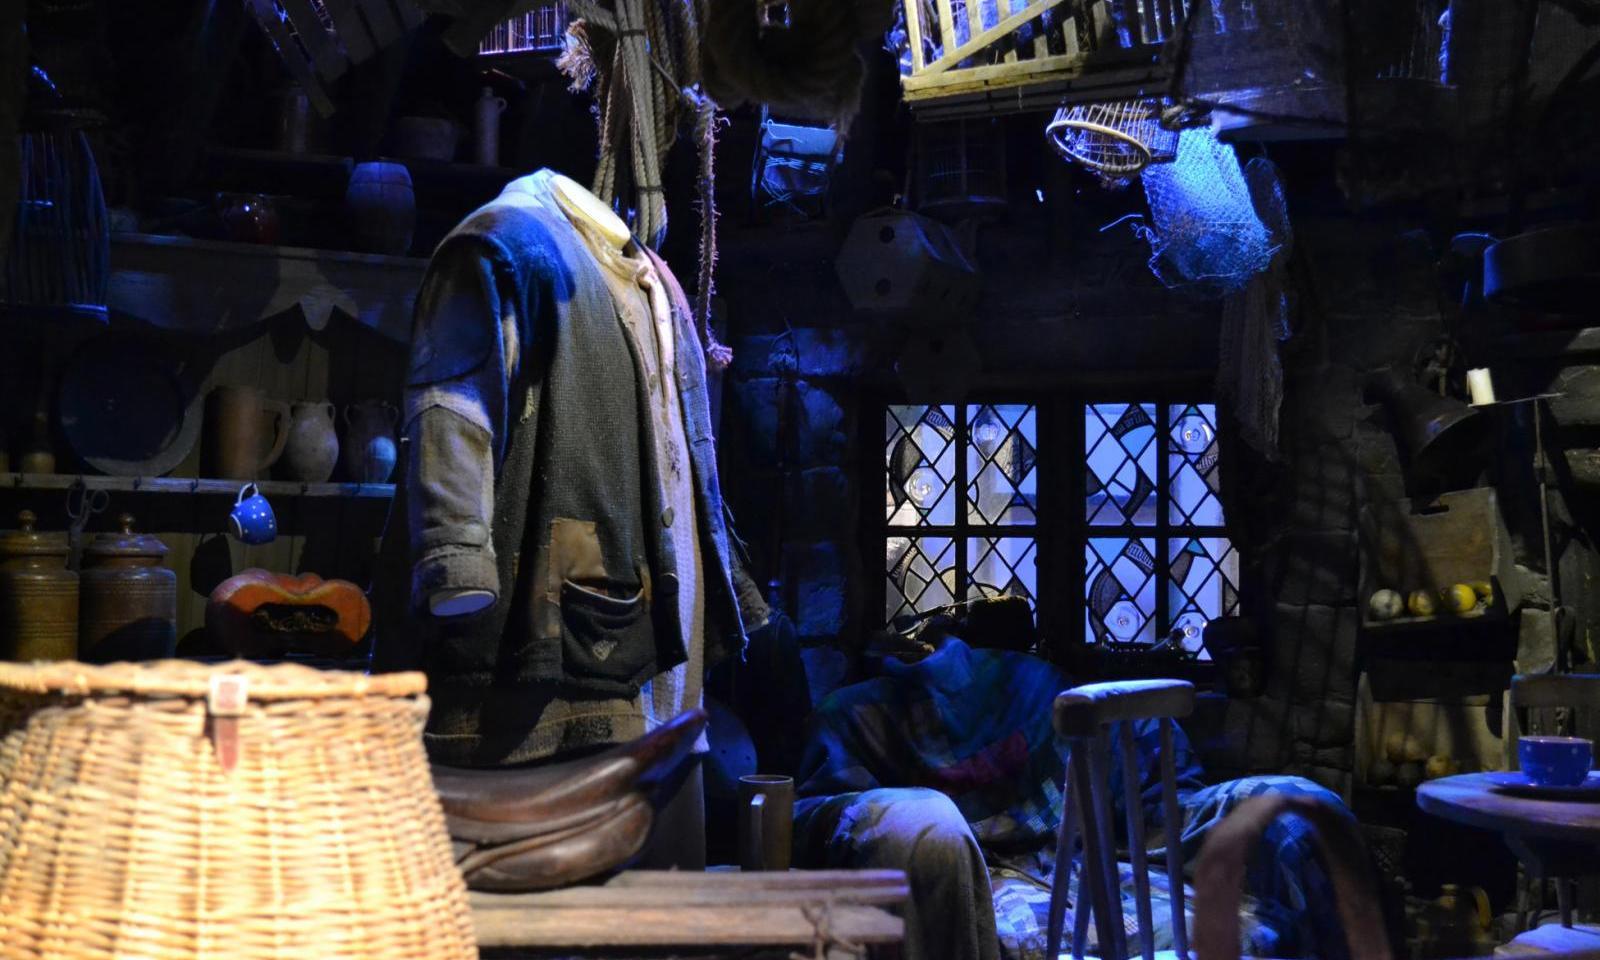 Harry Potter London Warner Bros.